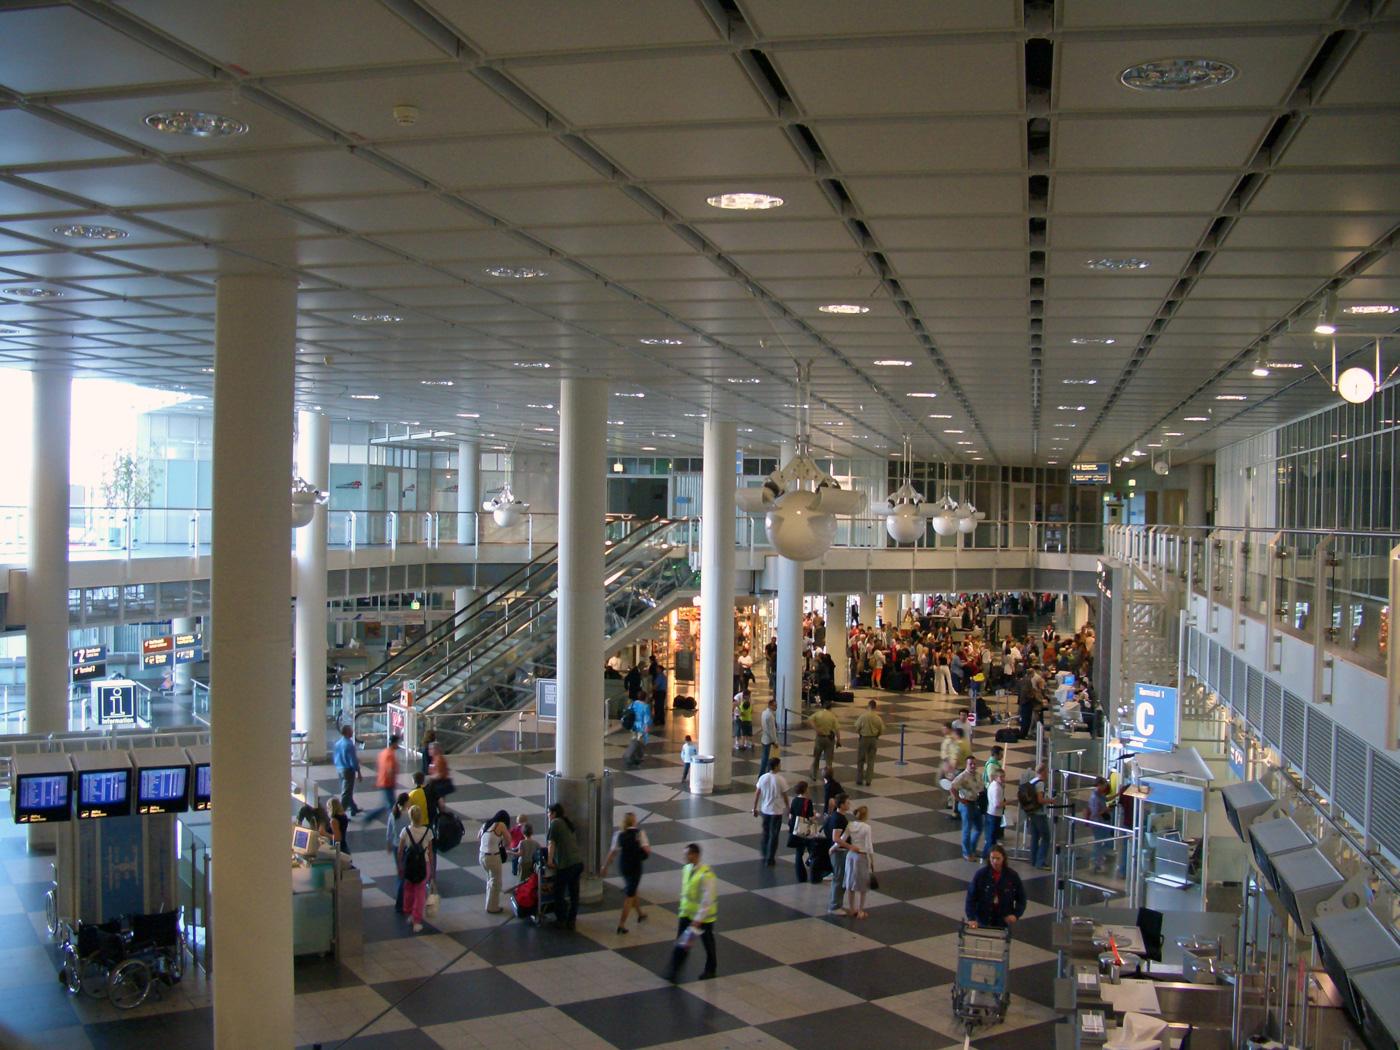 Destinations: Prayer Room at Munich Airport